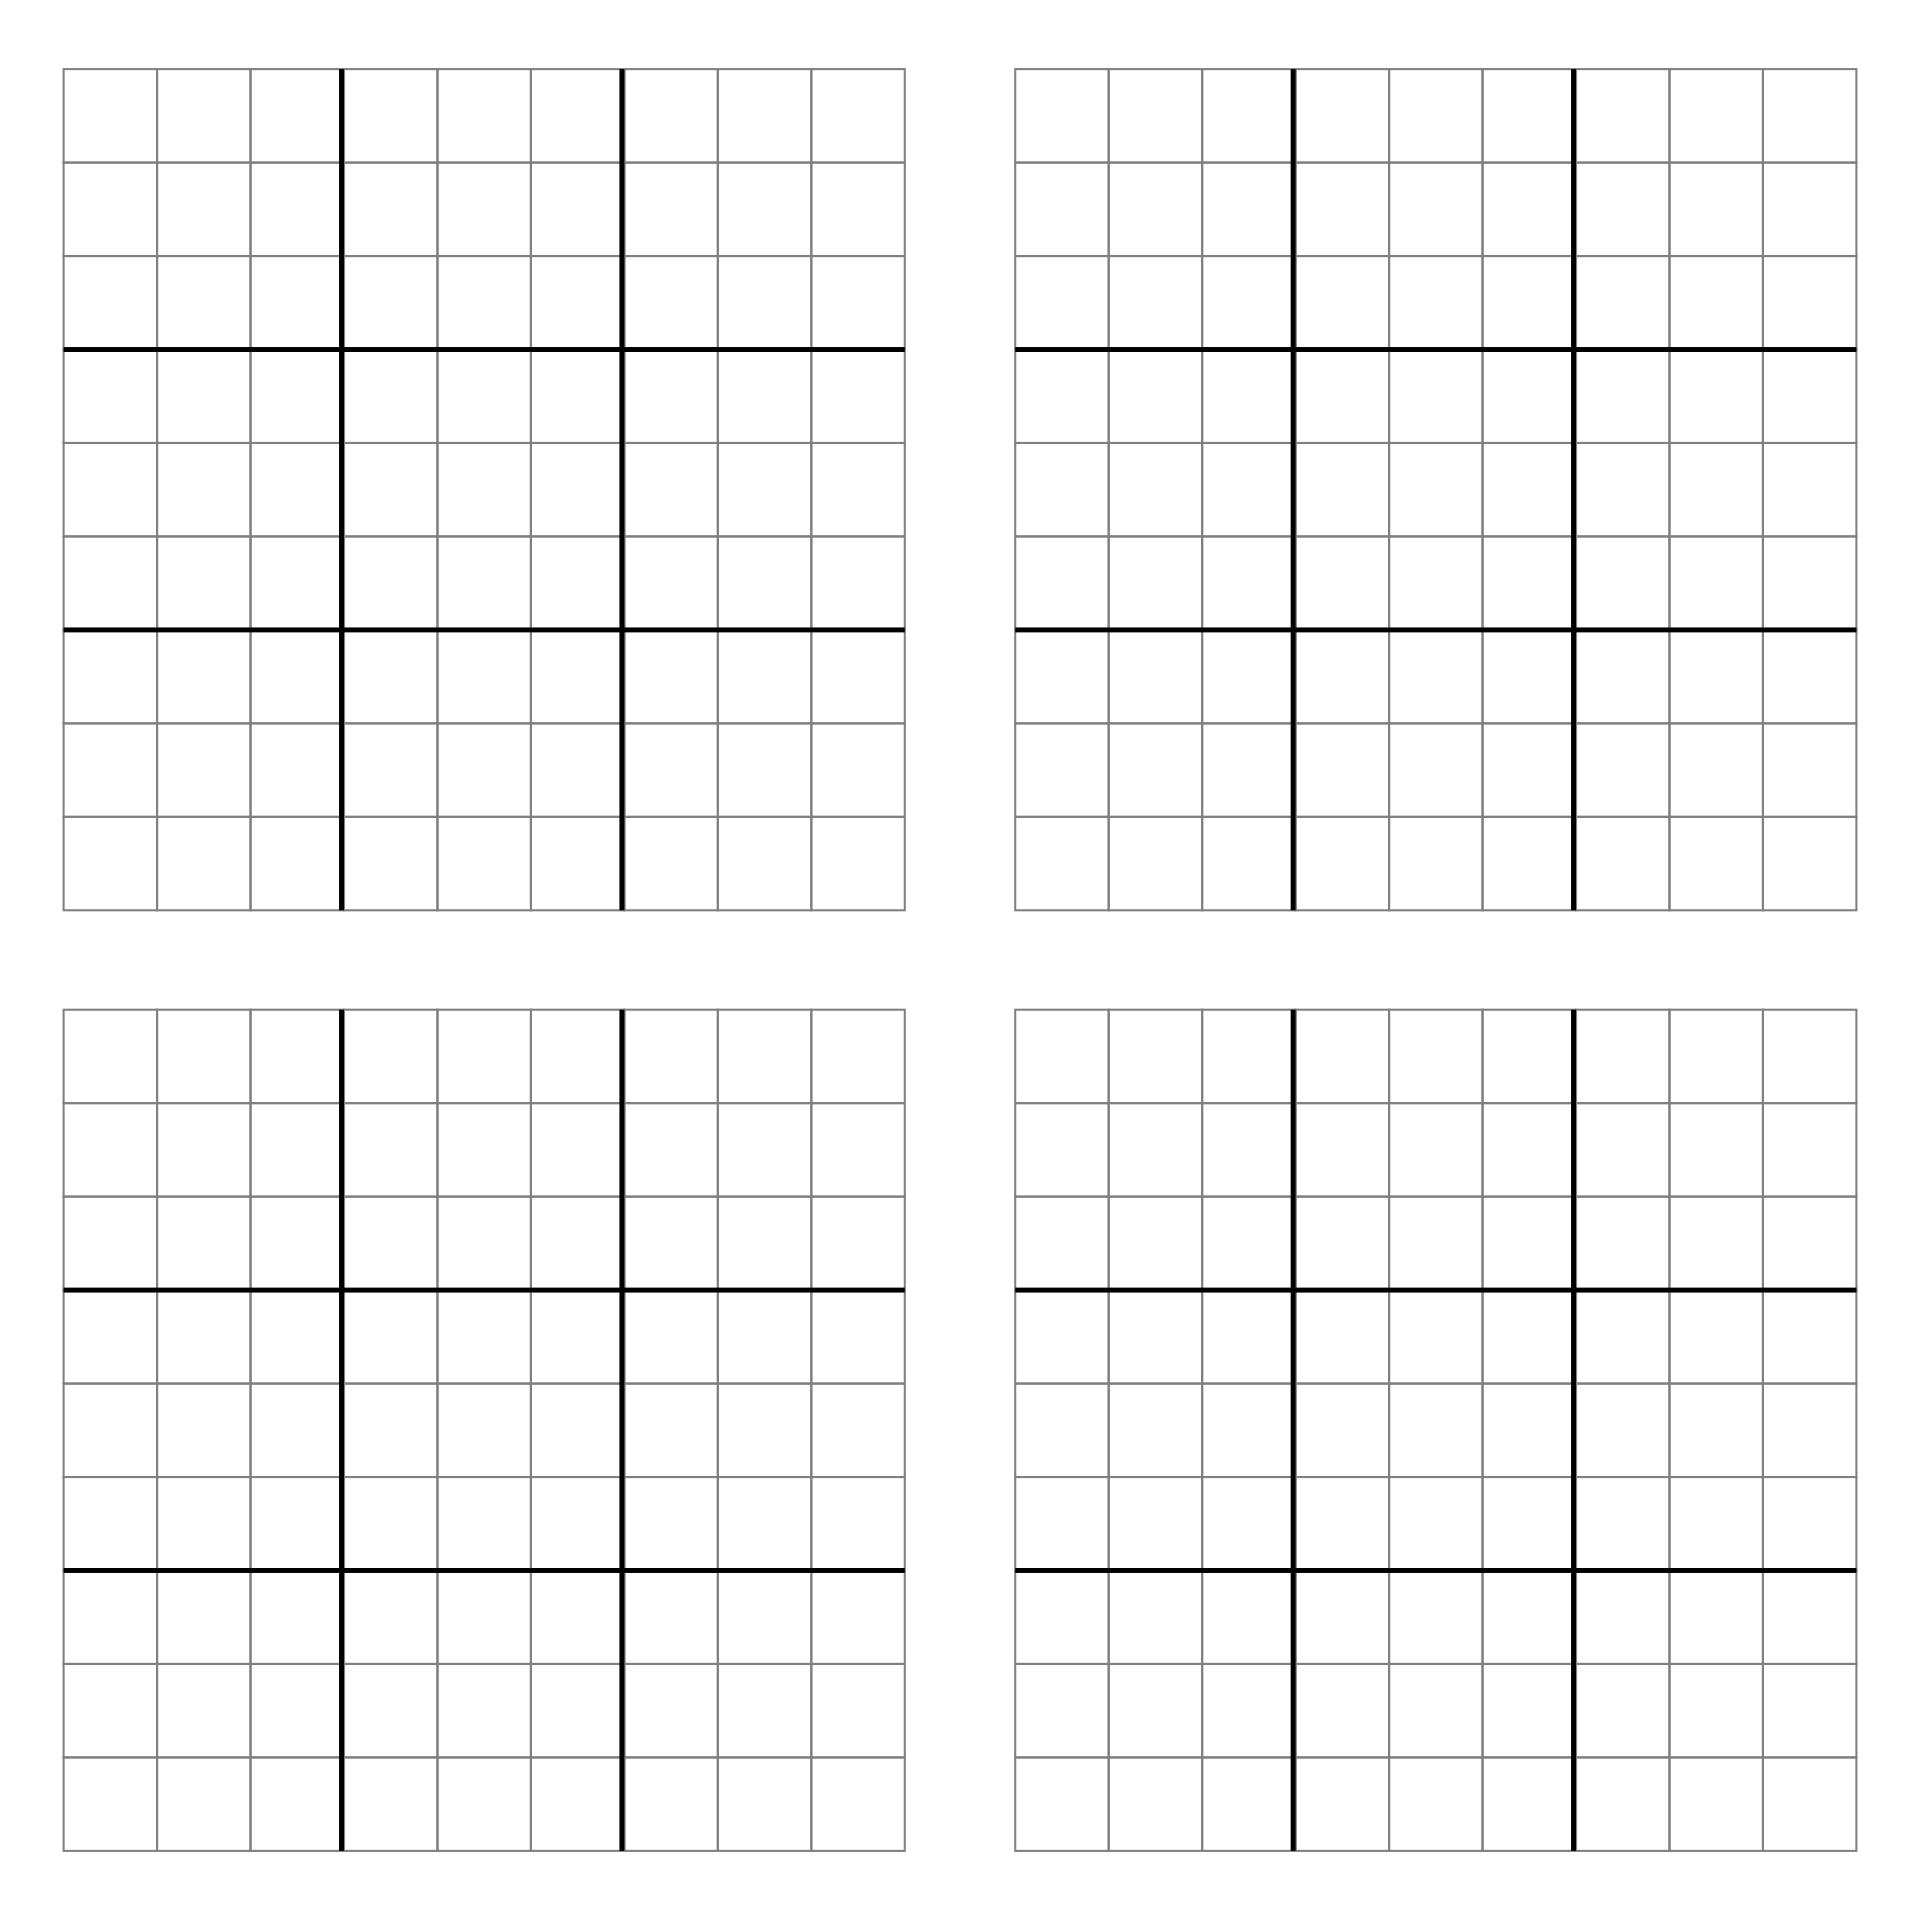 Printable Blank Sudoku Grid 2 Per Page